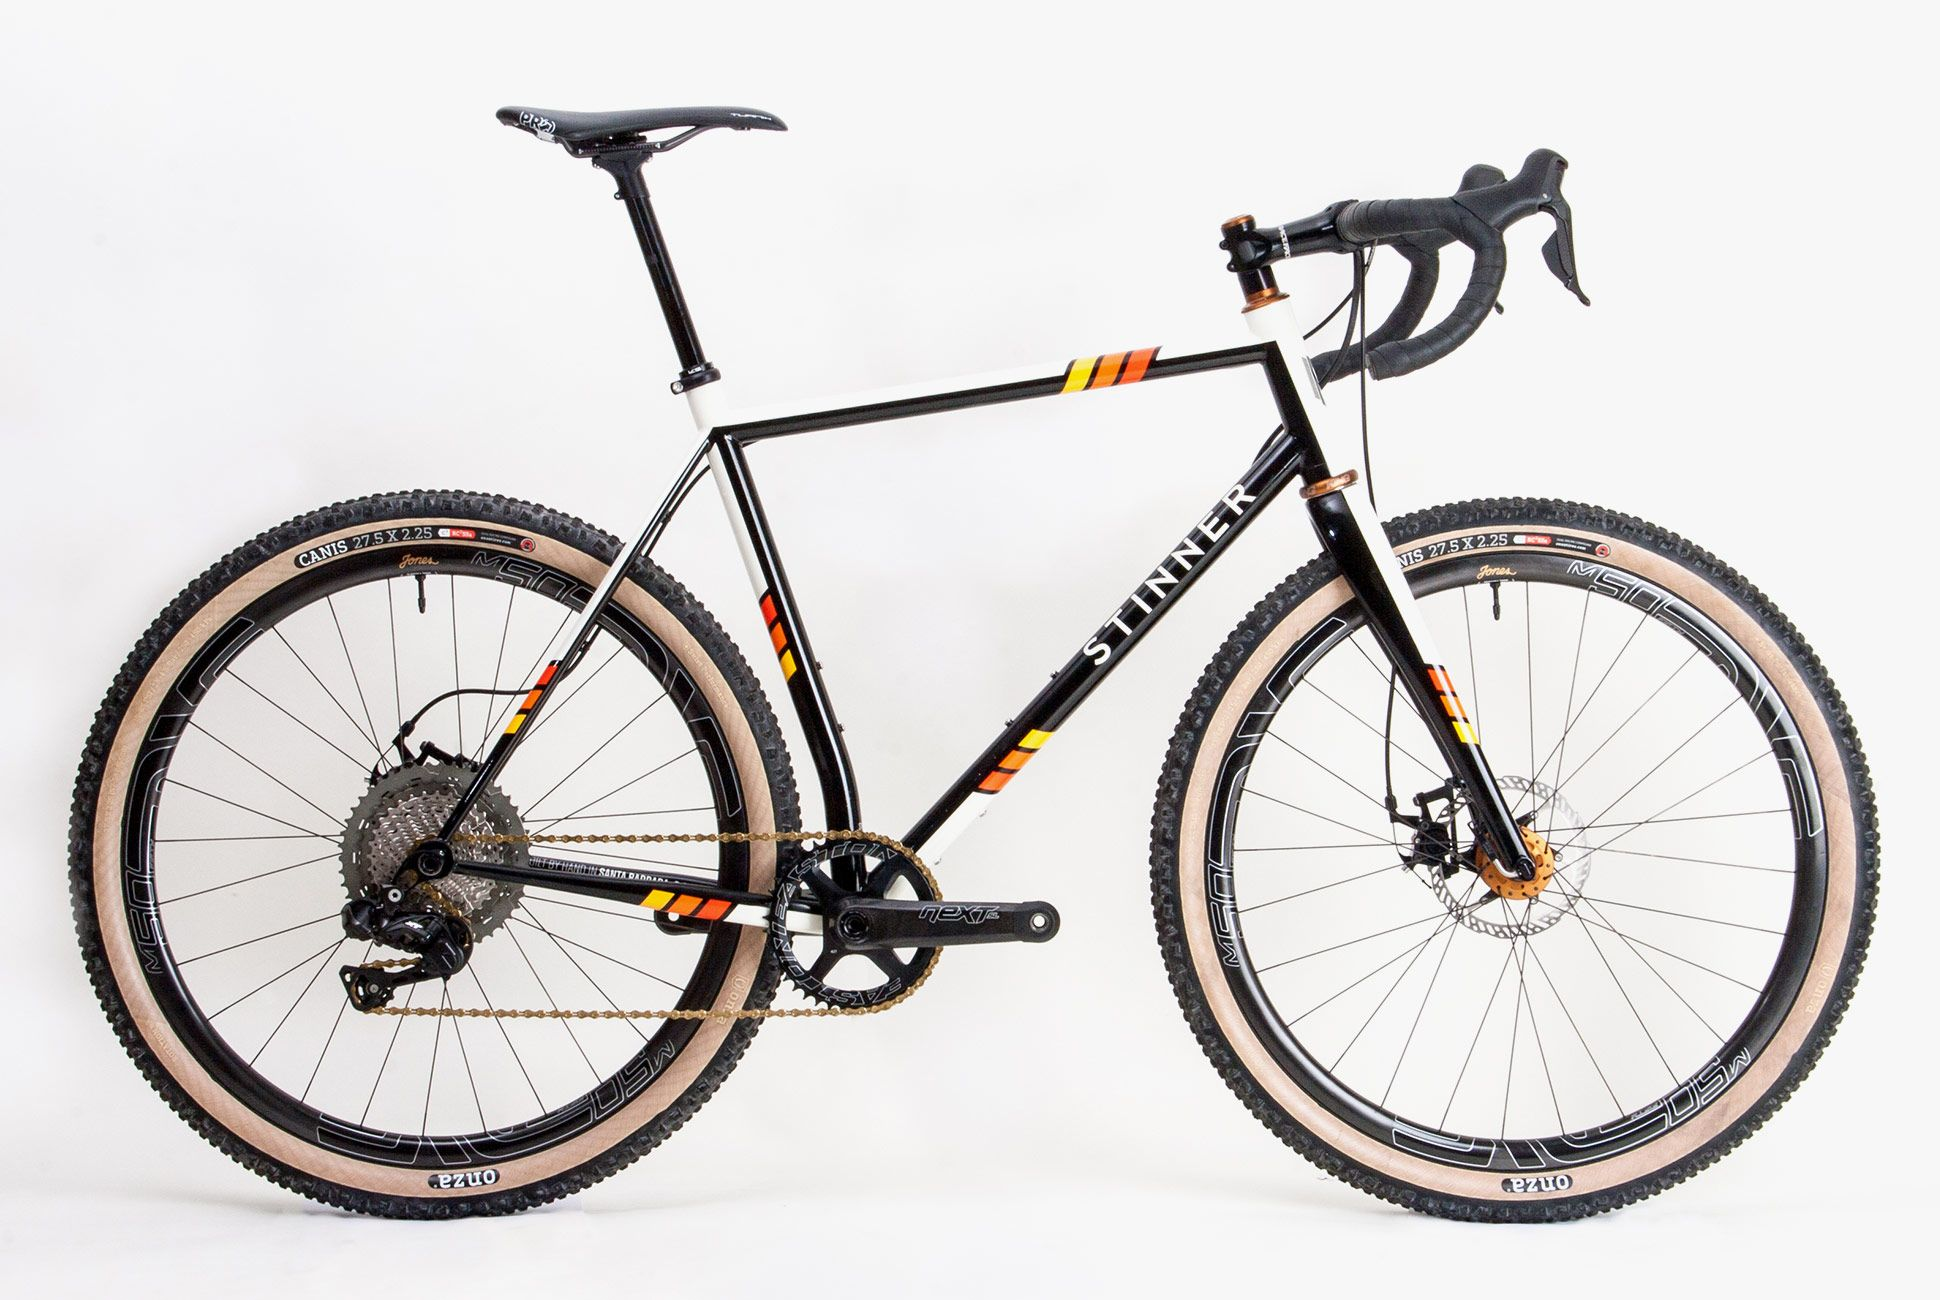 Bikes-From-NAHBS-Gear-Patrol-21